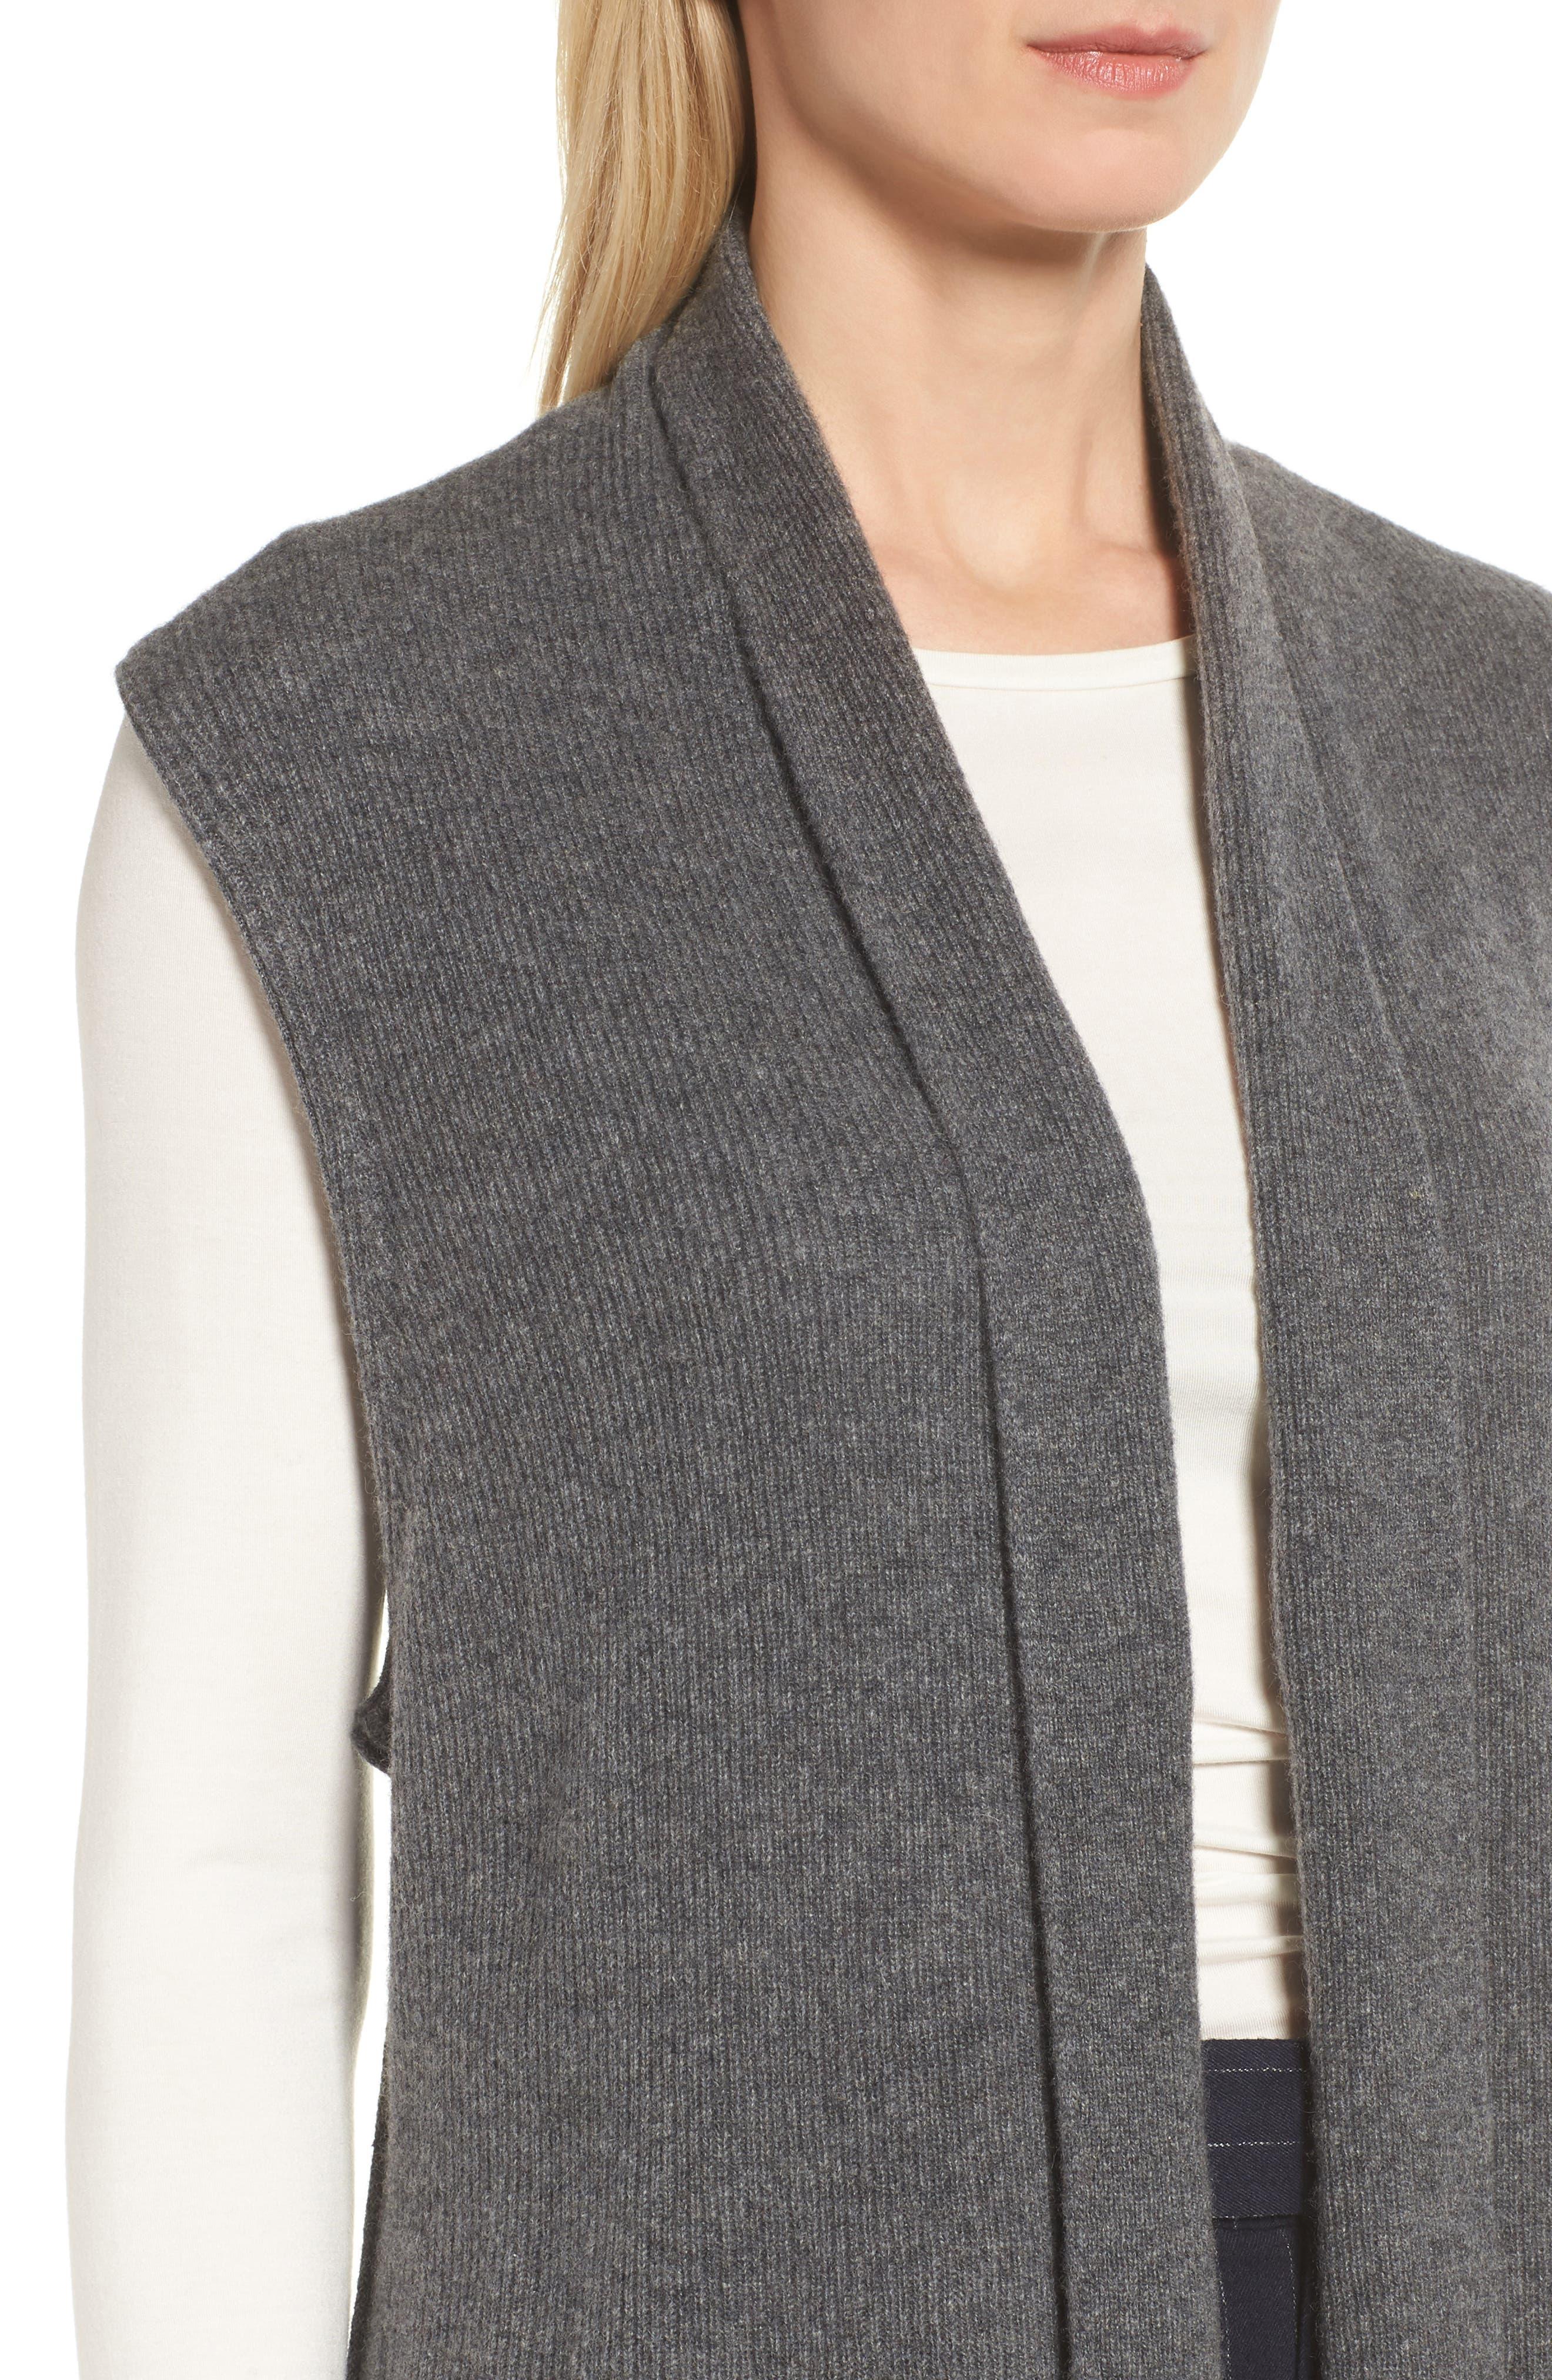 Ribbed Cashmere Vest,                             Alternate thumbnail 4, color,                             Grey Dark Heather